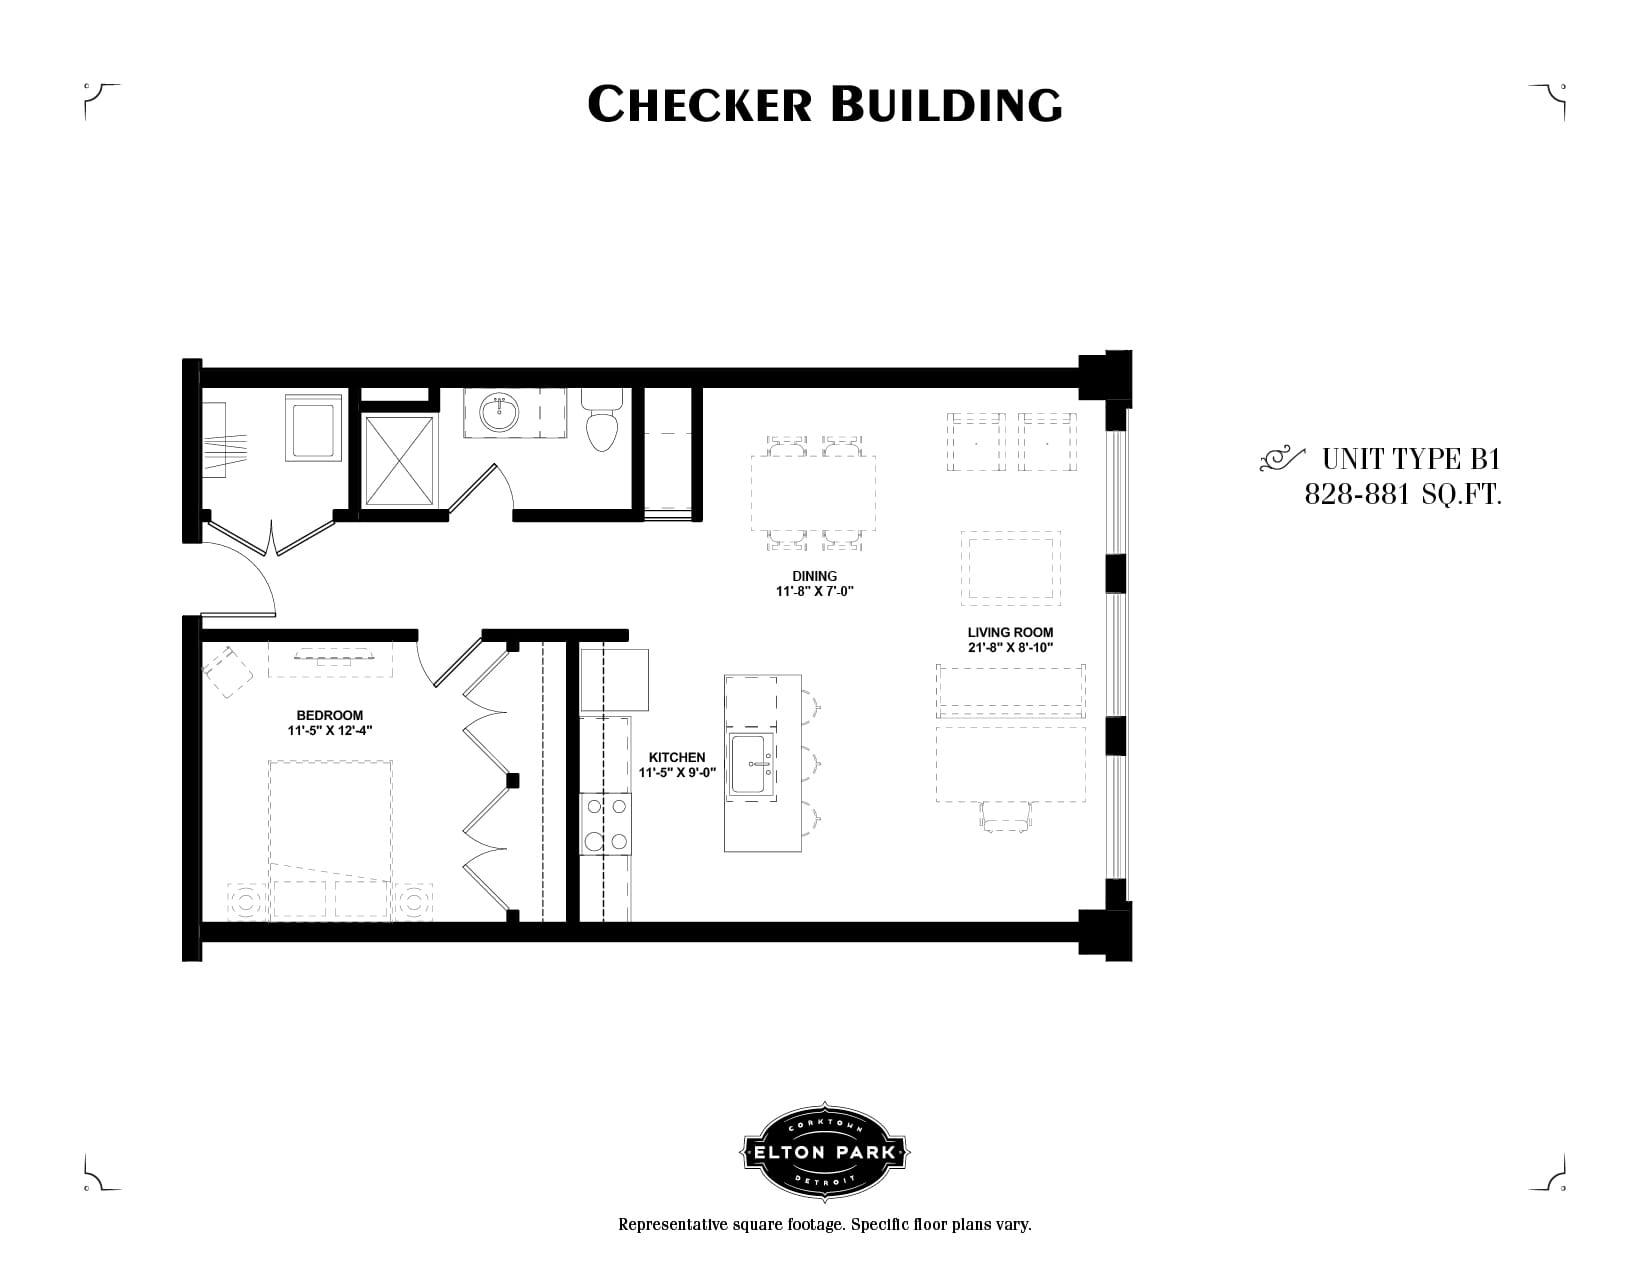 Checker Building Unit Type B1